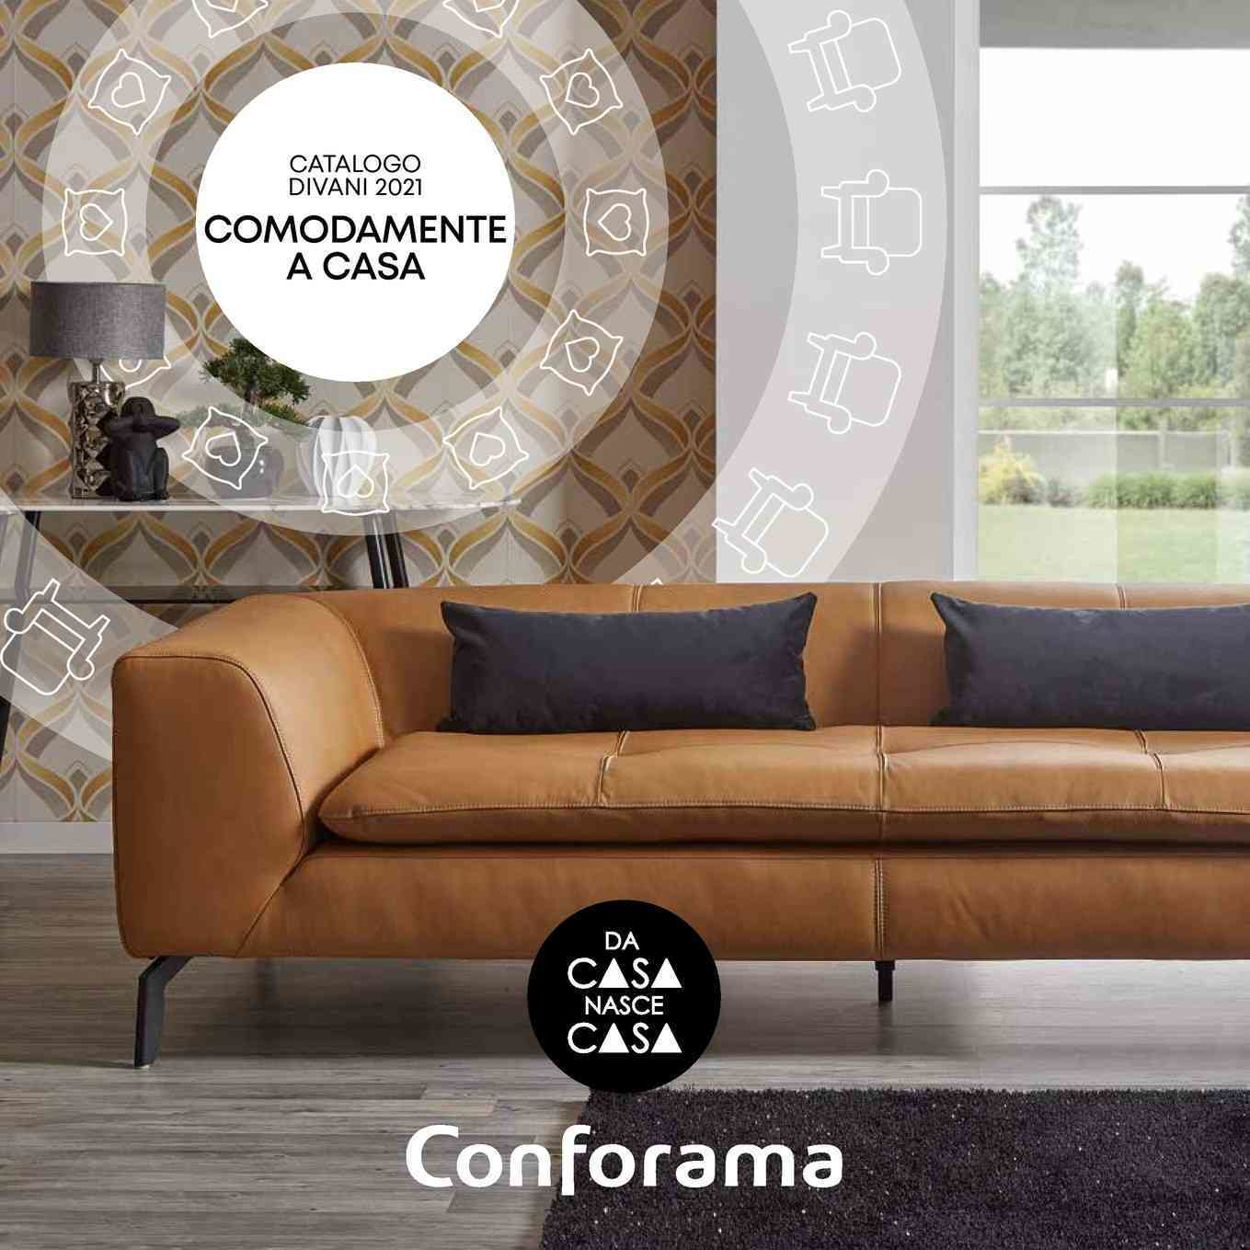 Volantino Conforama - Offerte 15/04-31/12/2021